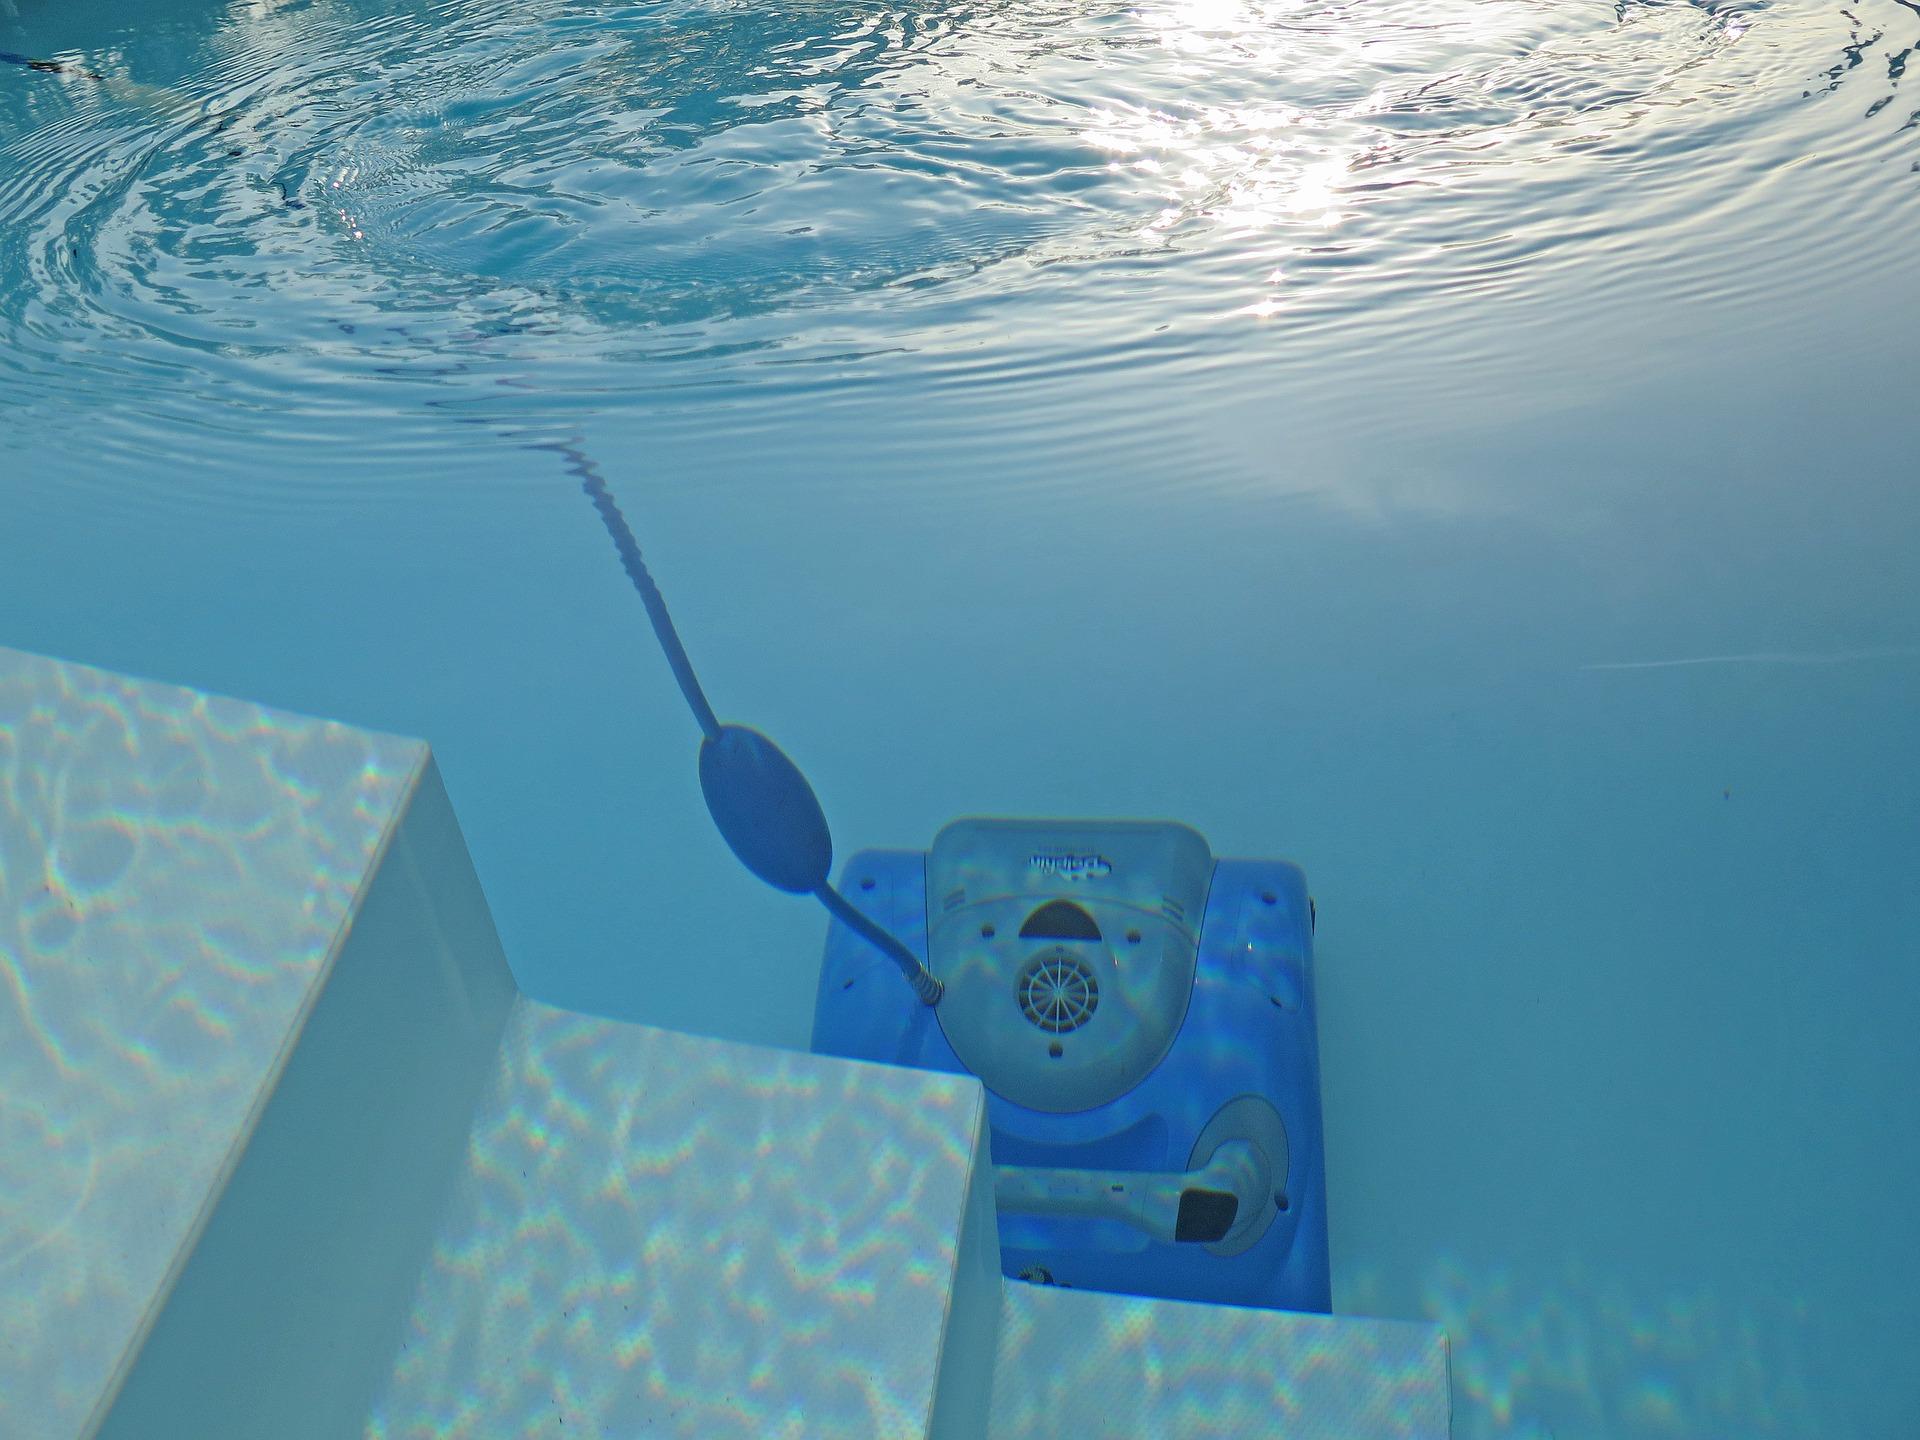 aspirateur piscine hors sol robot comparatif